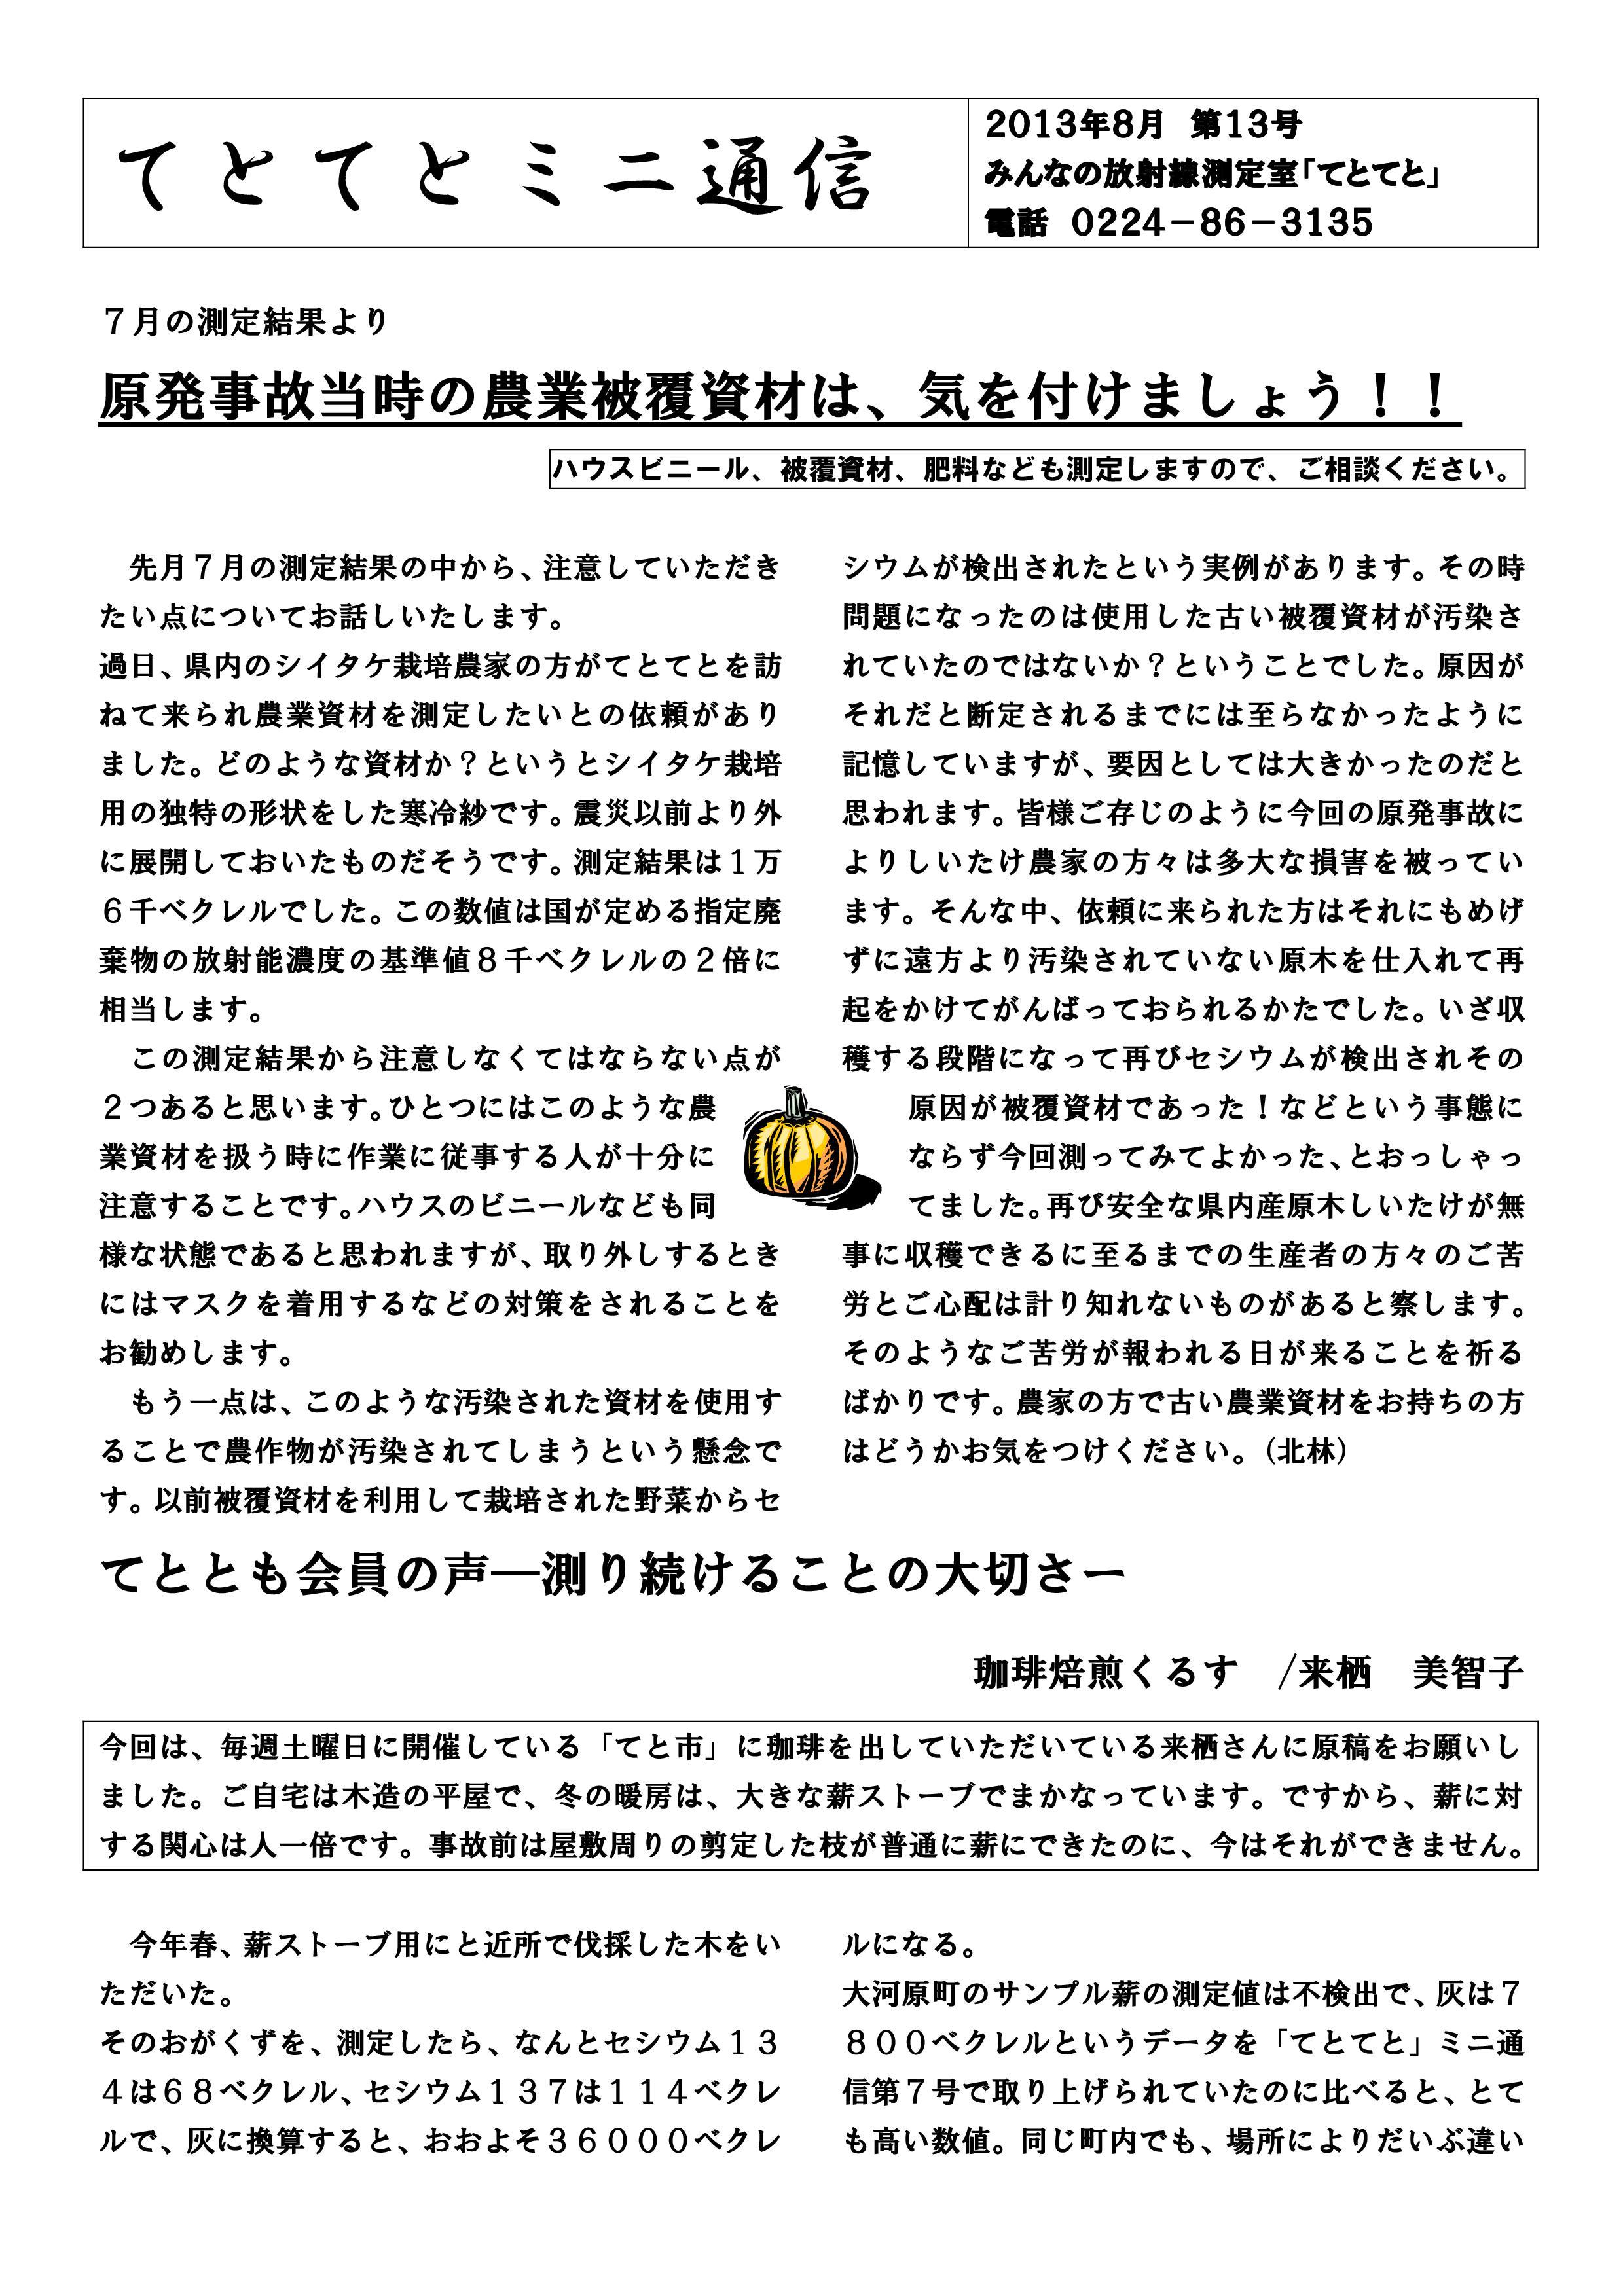 Microsoft Word - てとてとミニ通信 2013年8月-001